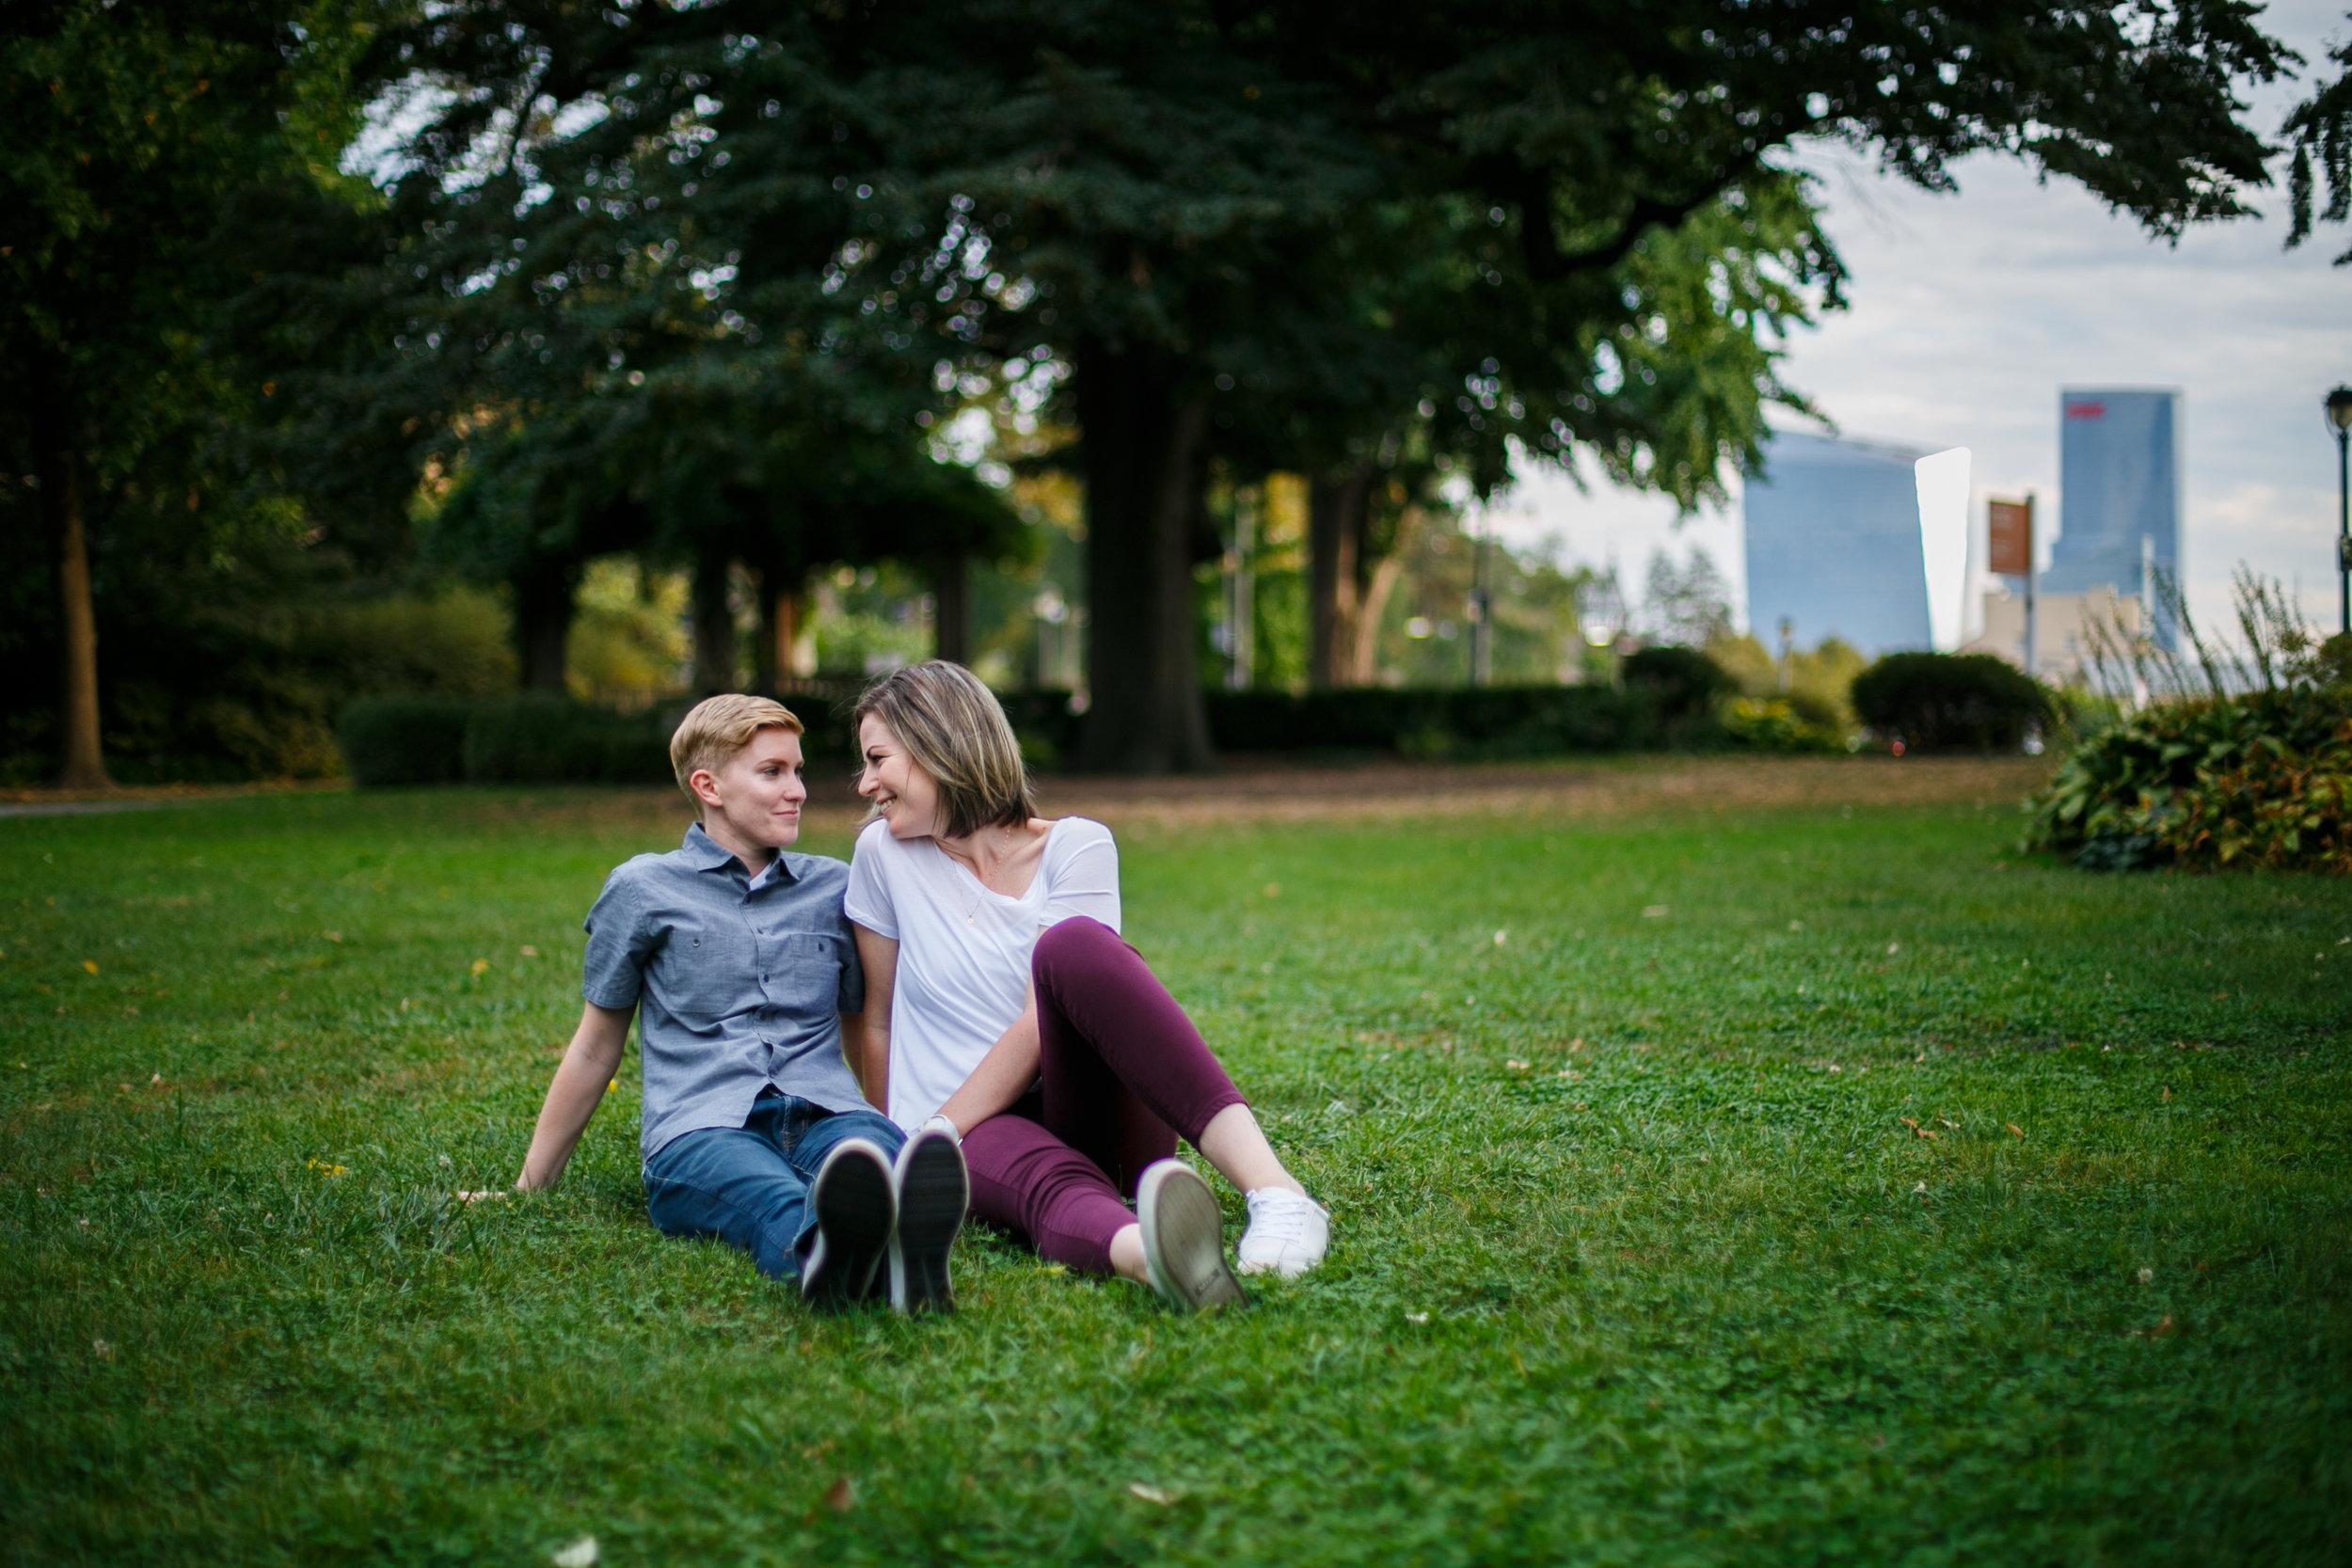 Philadelphia Queer Engagement Session by Lesbian Photographer Amanda Swiger 10